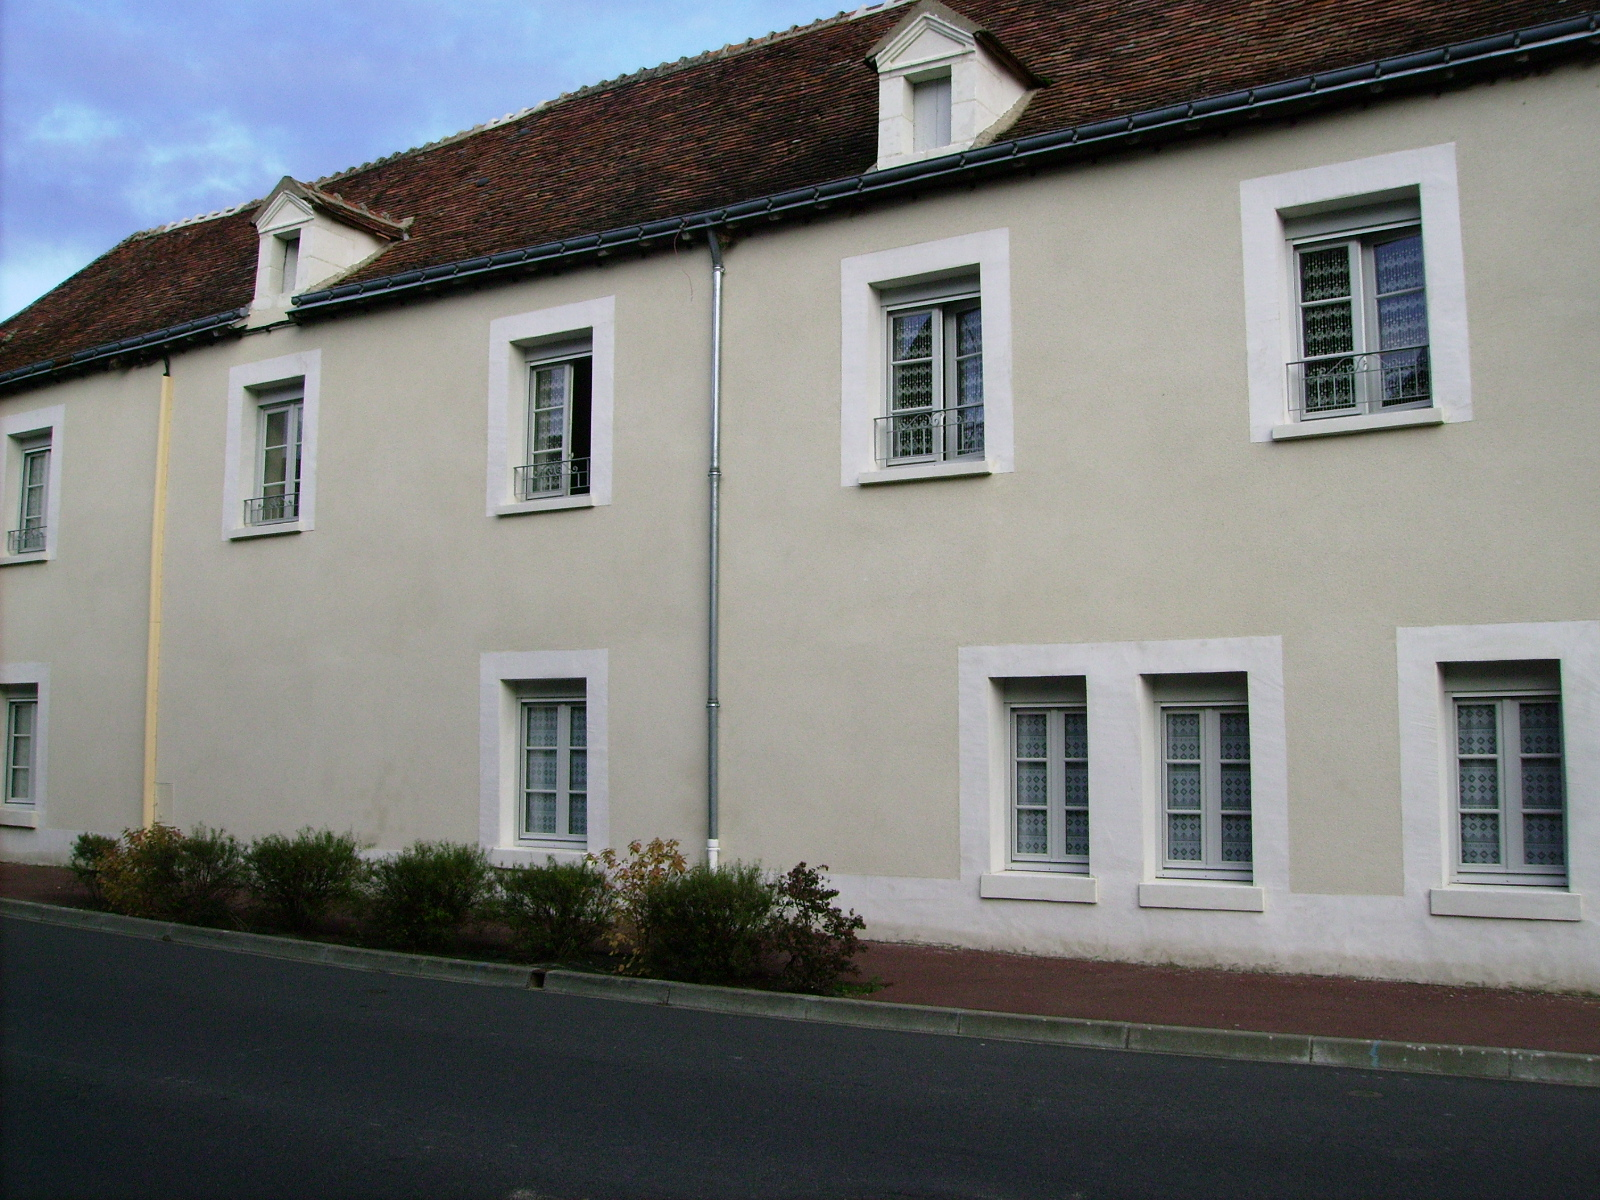 patrimoine-et-infrastructures-sportives/logements-adaptes-3.JPG